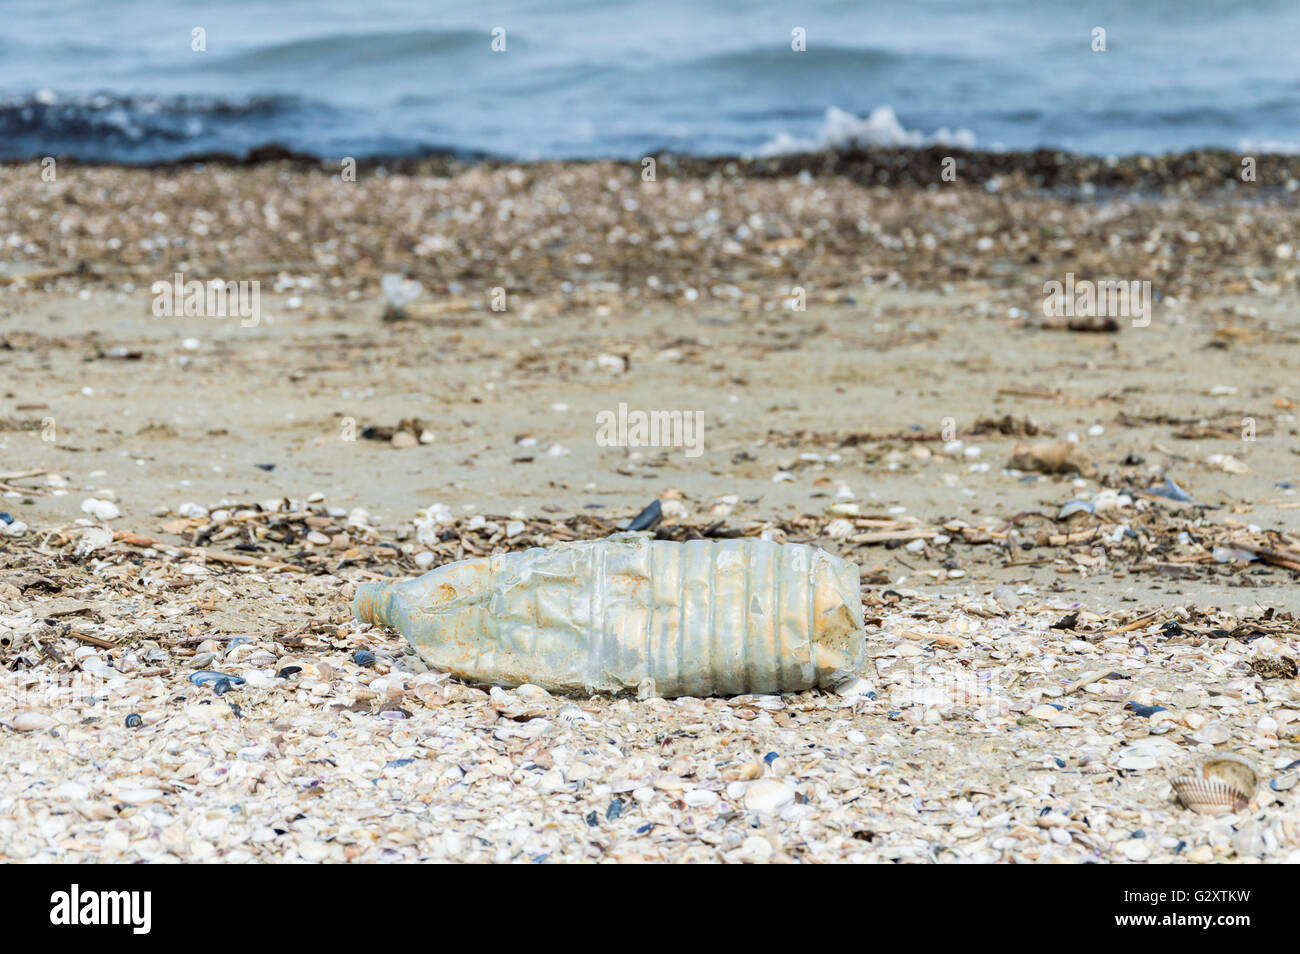 plastic bottle on the beach - Stock Image